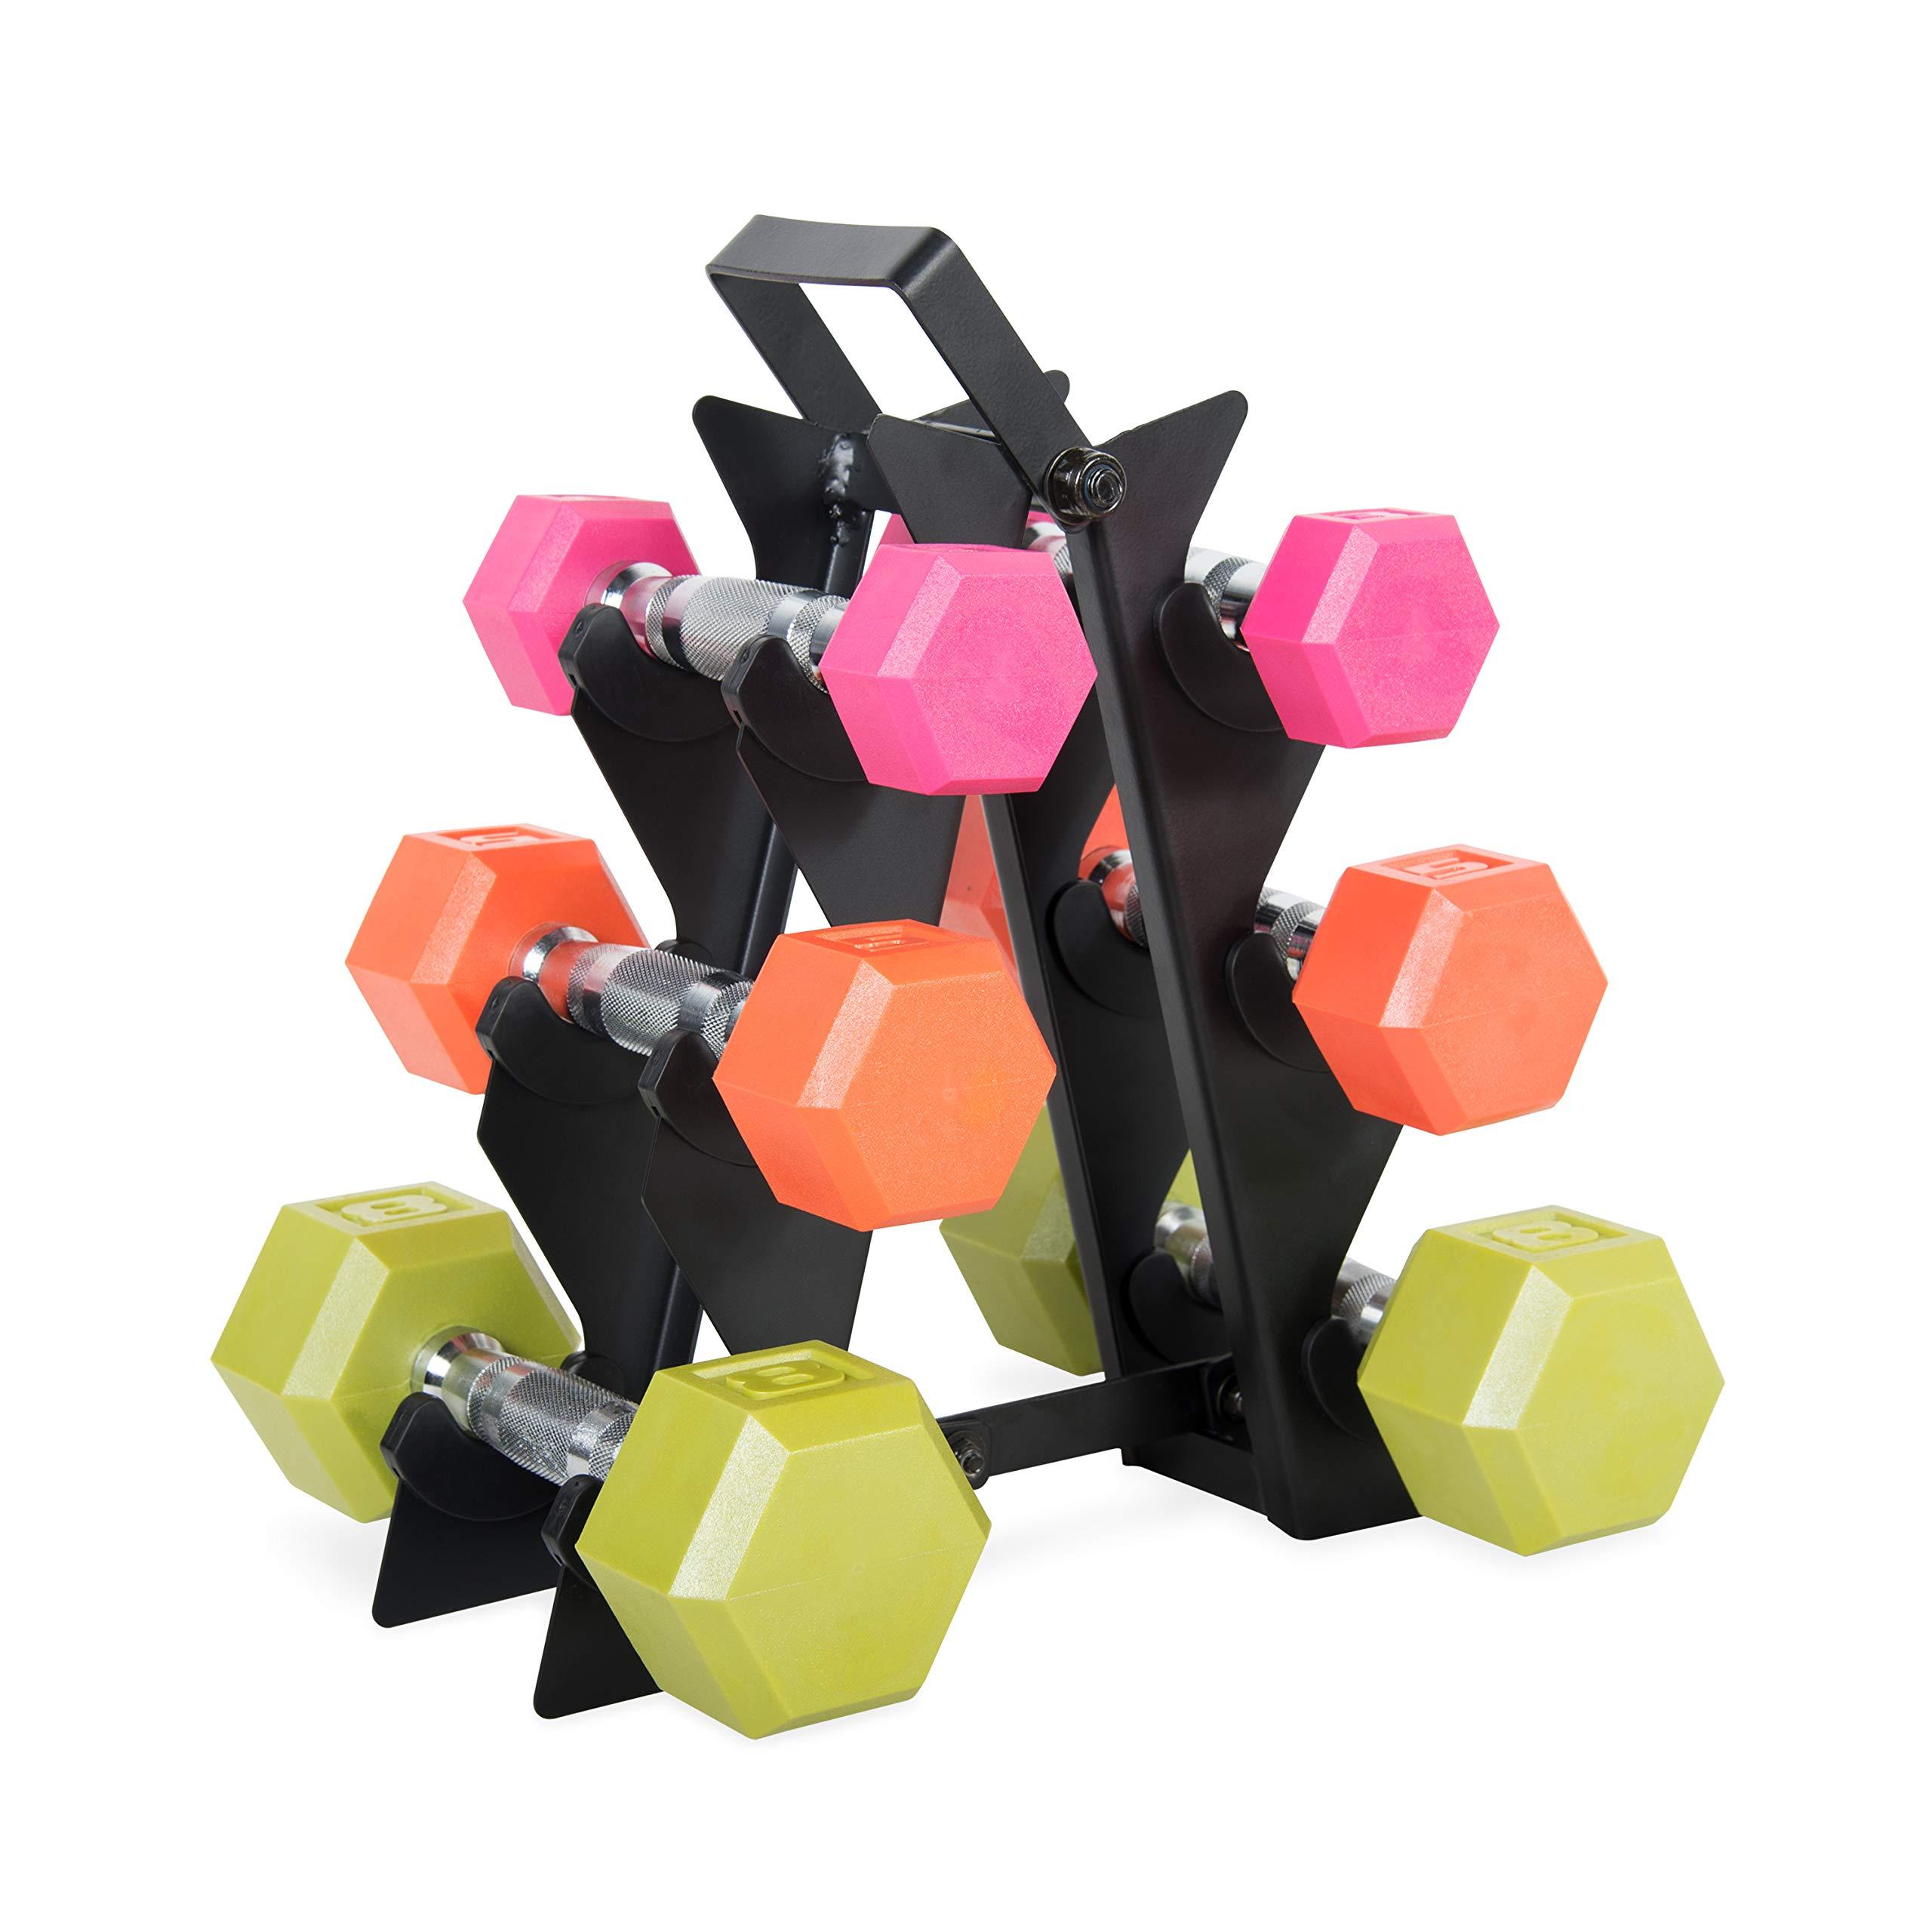 WF Athletic Supply Dumbbell Set with Storage Rack (32lb Color Coated Dumbbell Set)